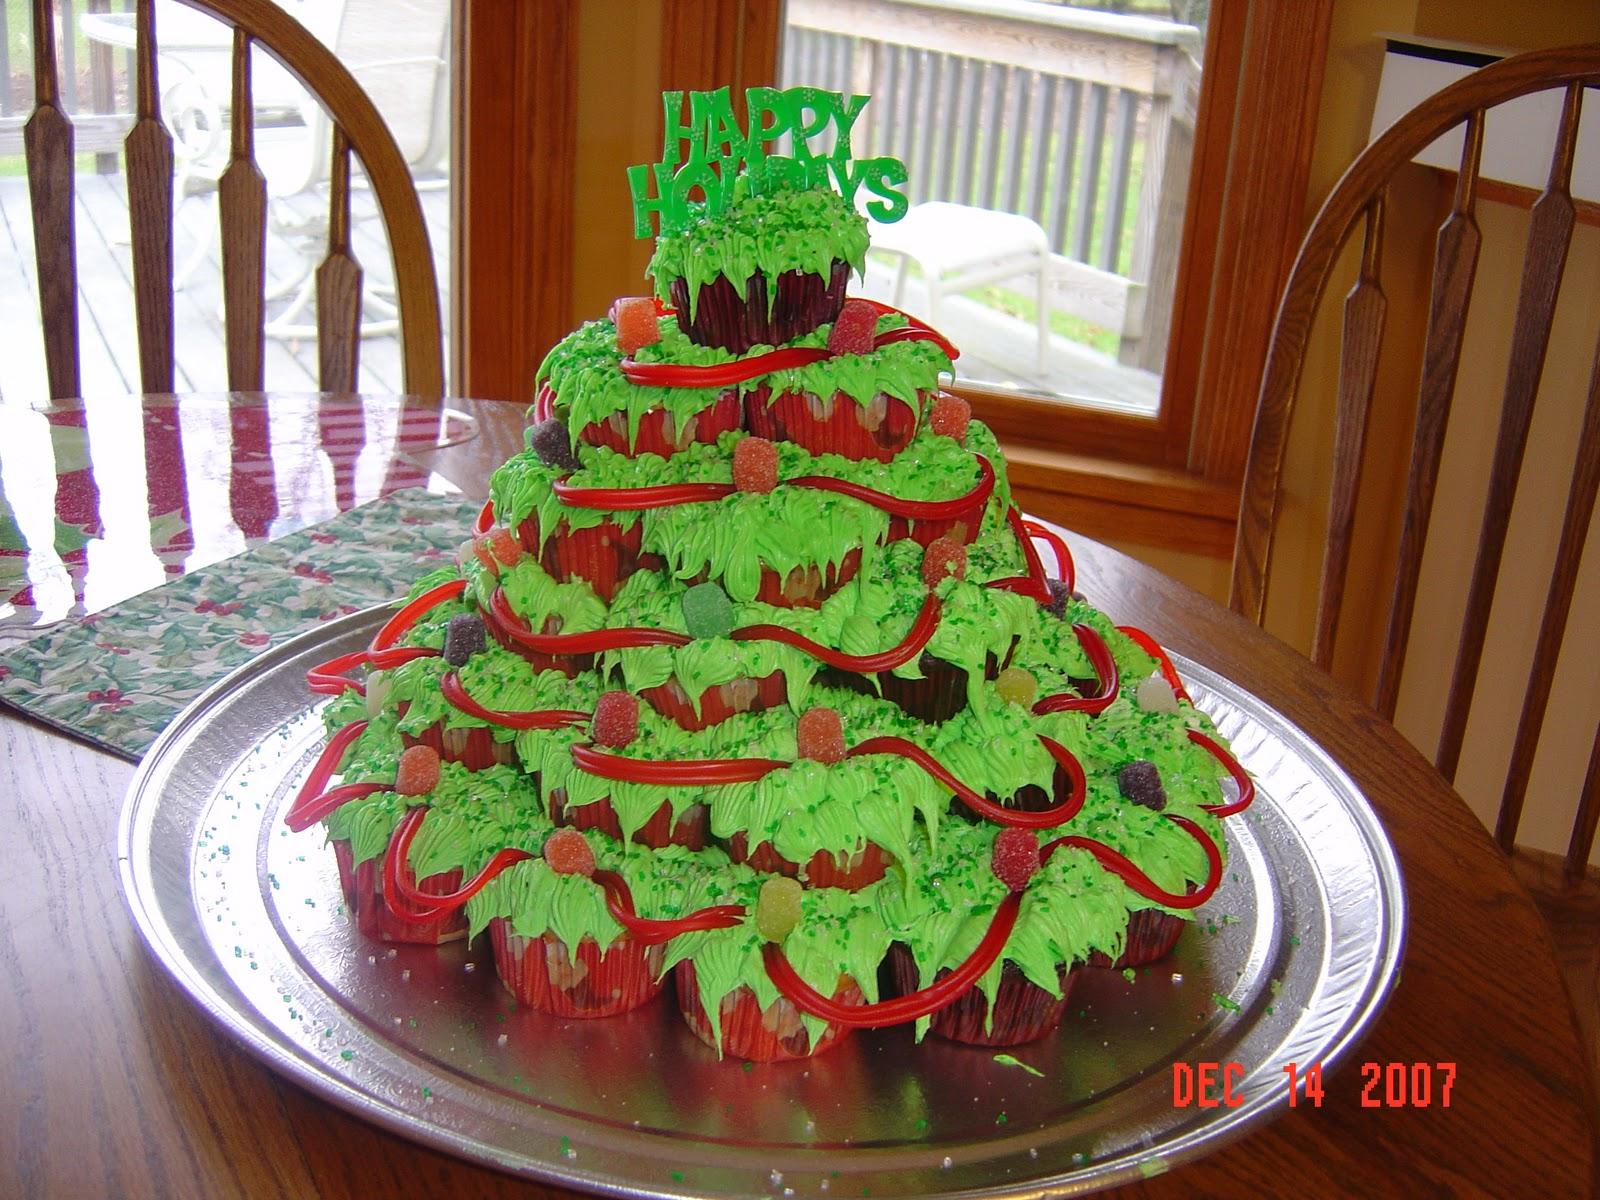 Cake Decorating Christmas Trees : Festivals Pictures: christmas tree cake pictures, latest ...